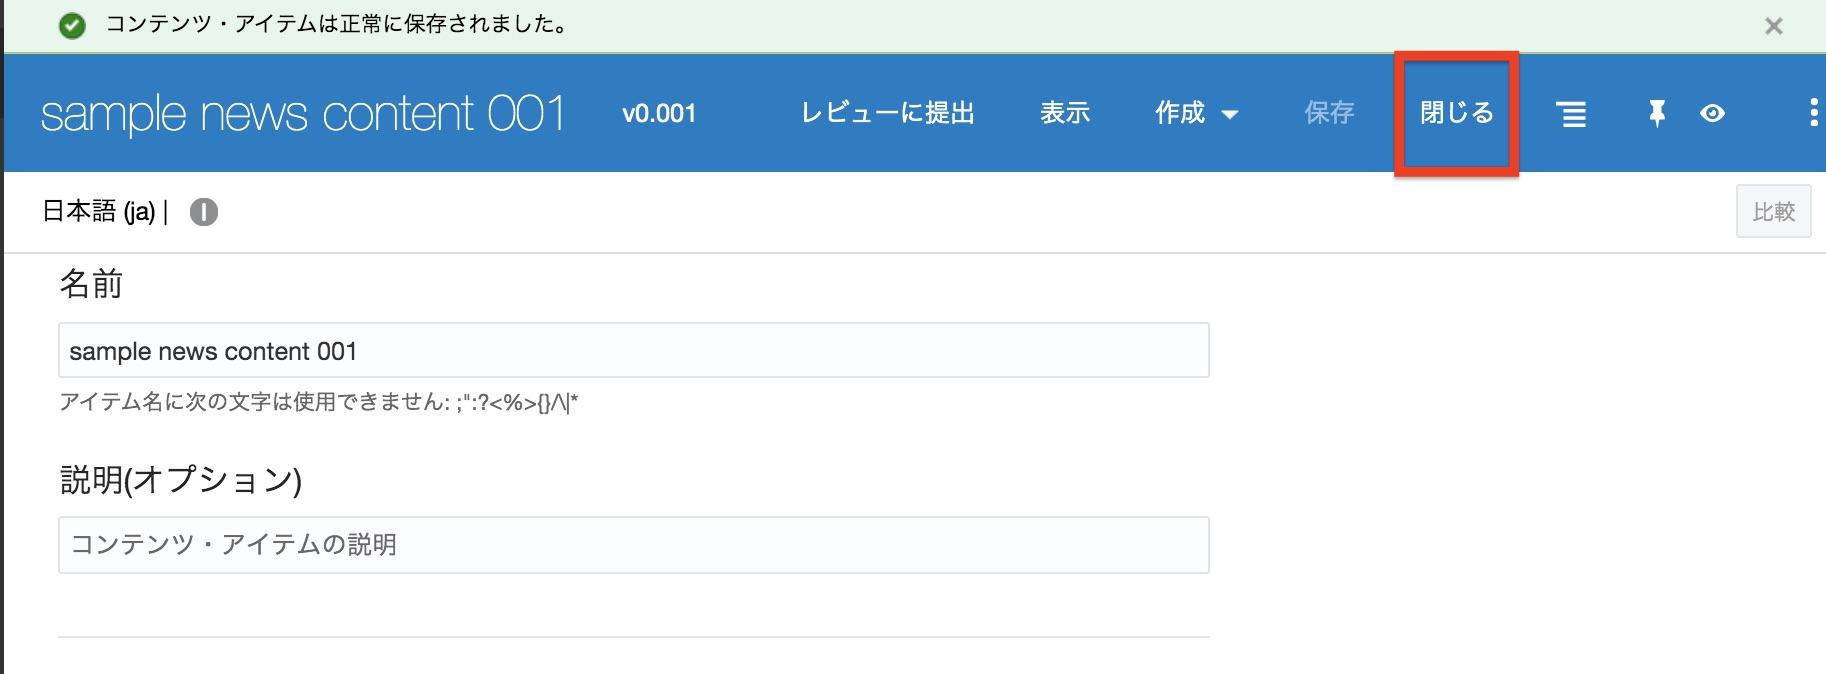 image_oce38.jpg